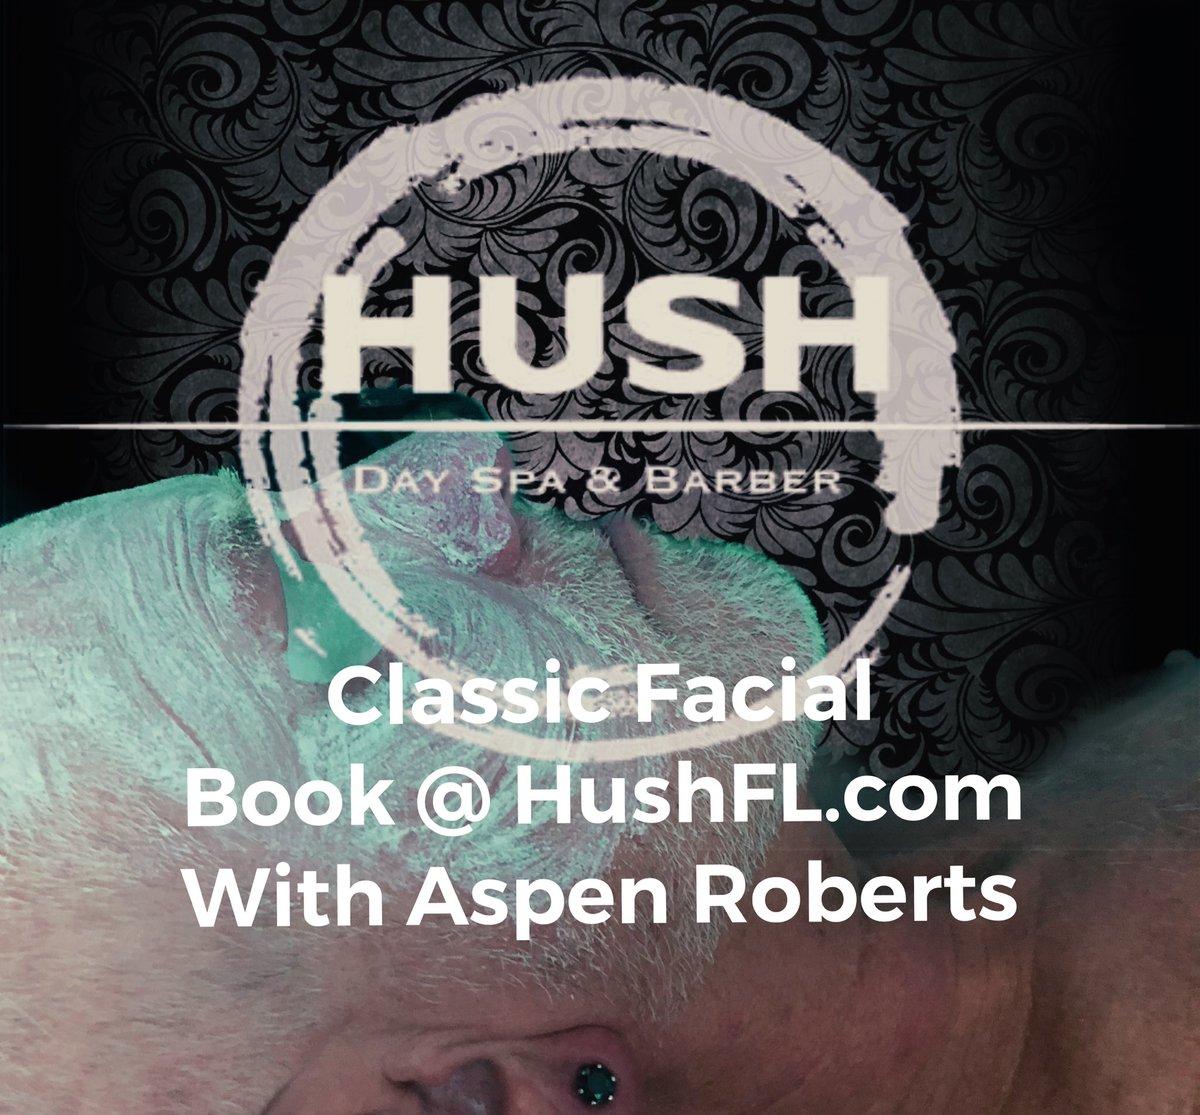 Book online http://HushFL.com #spa #dayspa #grooming #bodygrooming # #facials #microdermabrasion #microderm #ftlauderdale #hushspa #wiltonmanors #haircut #barber #gaybarber #massage #gay #gaybusiness #bodypositive #selfcare #shave #razorshave #ftlauderdale #wiltonmanorspic.twitter.com/p8OIRfqM61